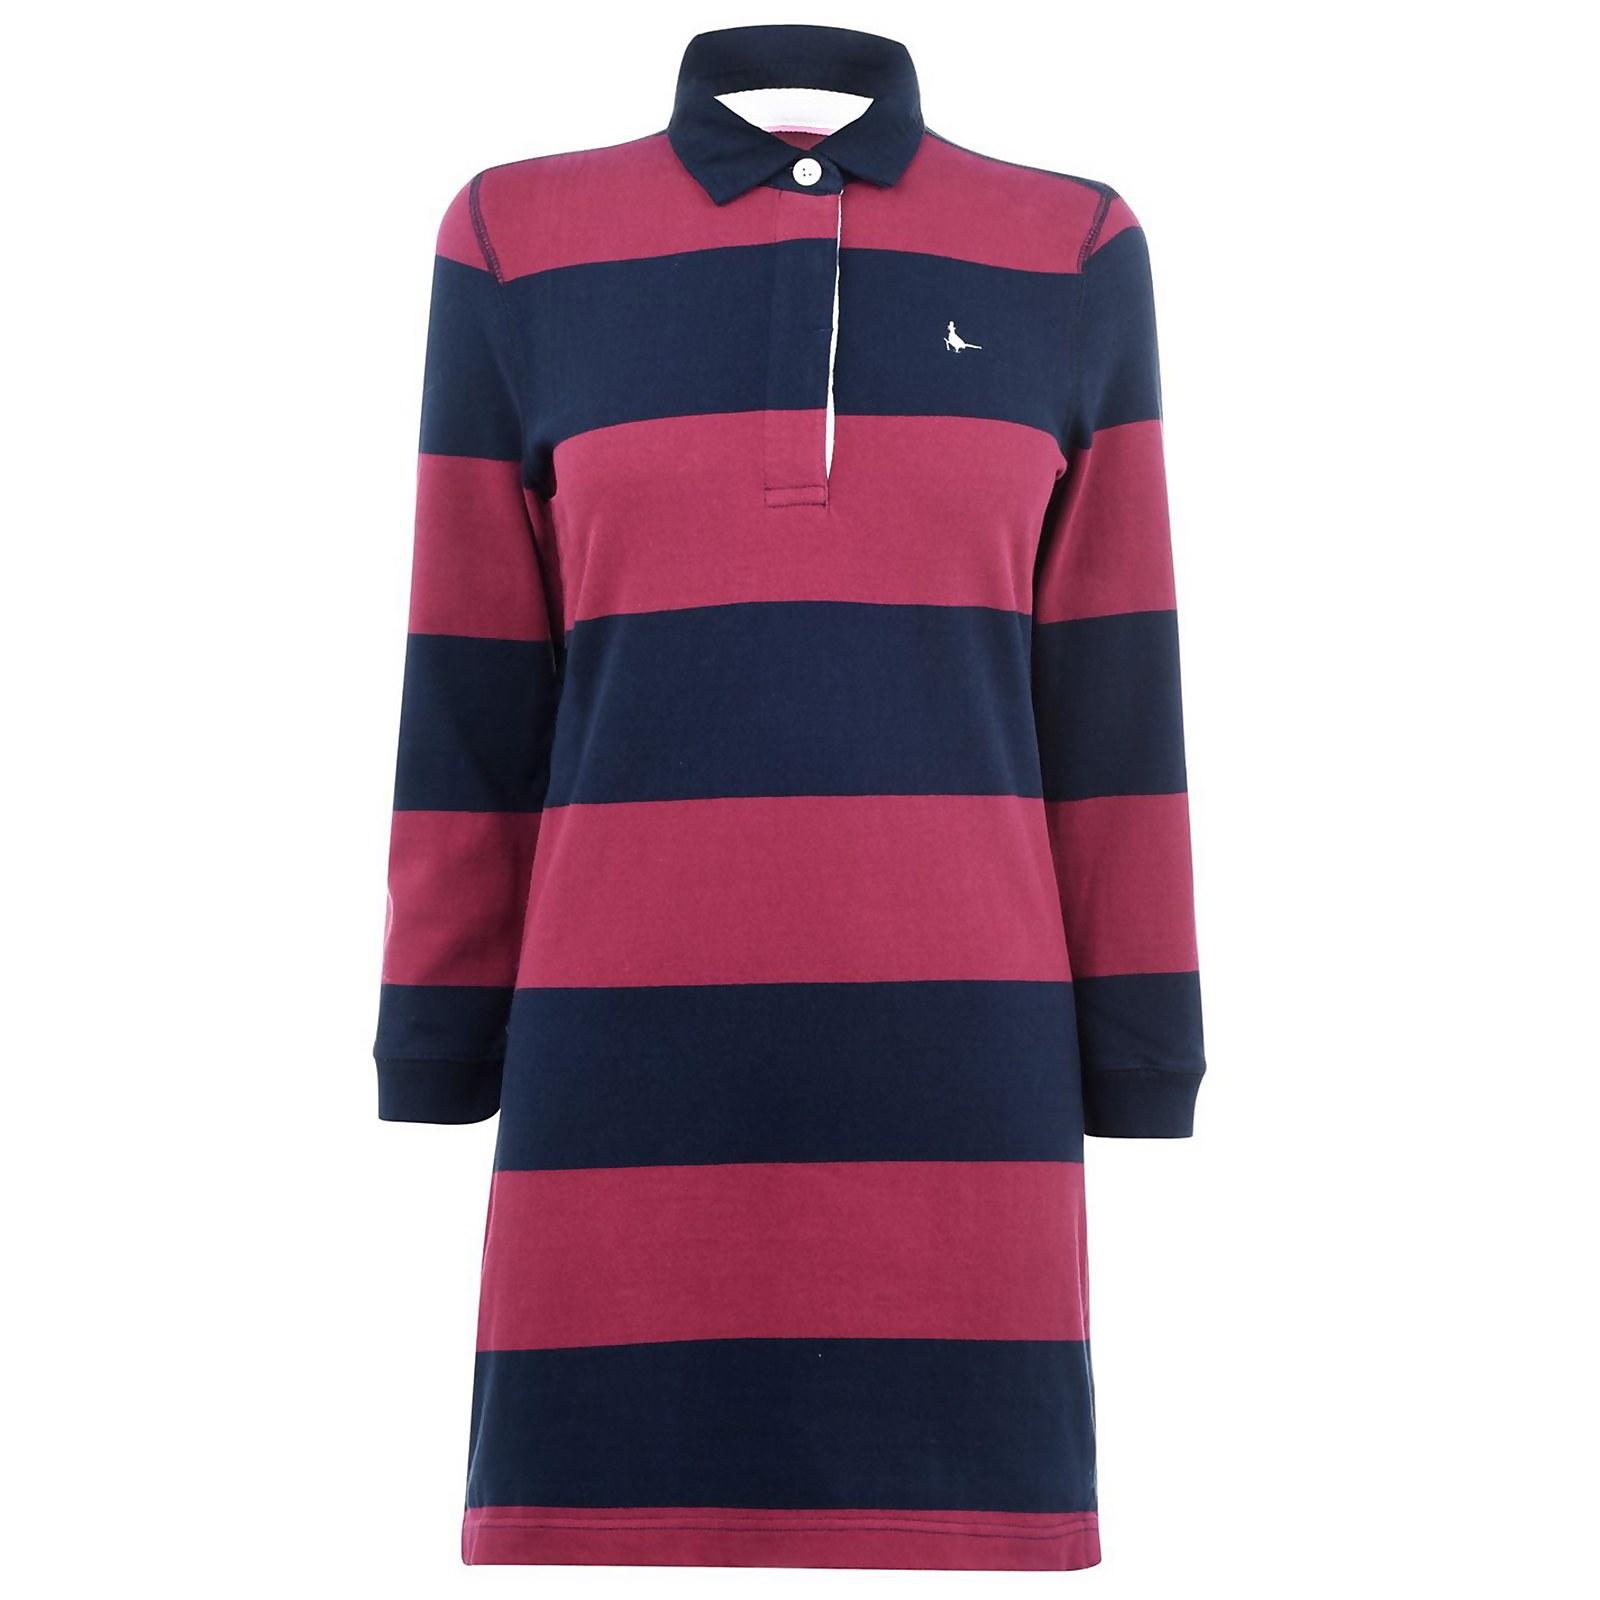 Worlington Rugby Dress - Damson/Navy